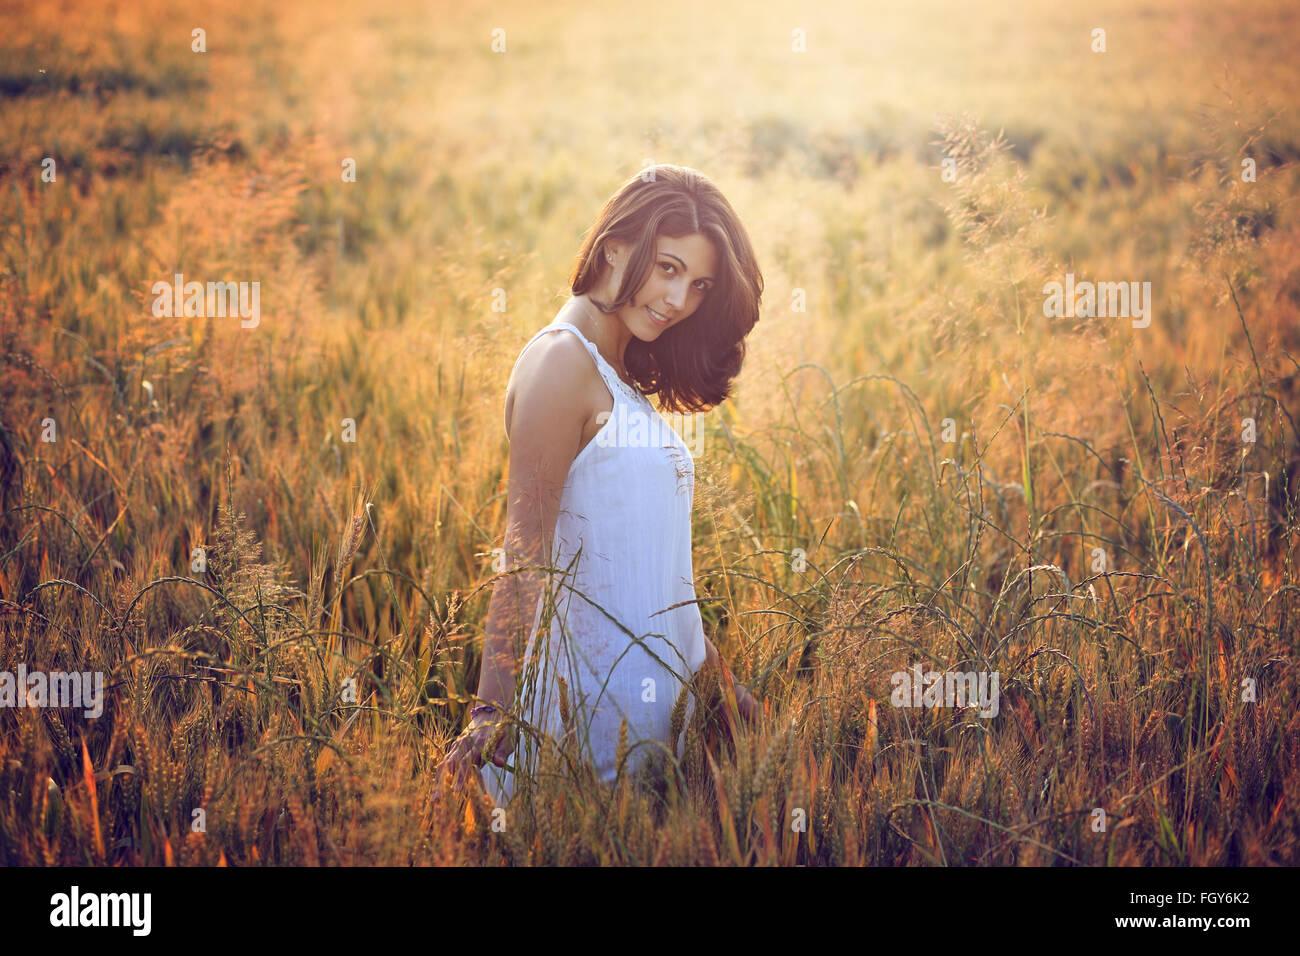 Hermosa mujer joven en un campo de verano. Cálido atardecer retrato de luz Imagen De Stock